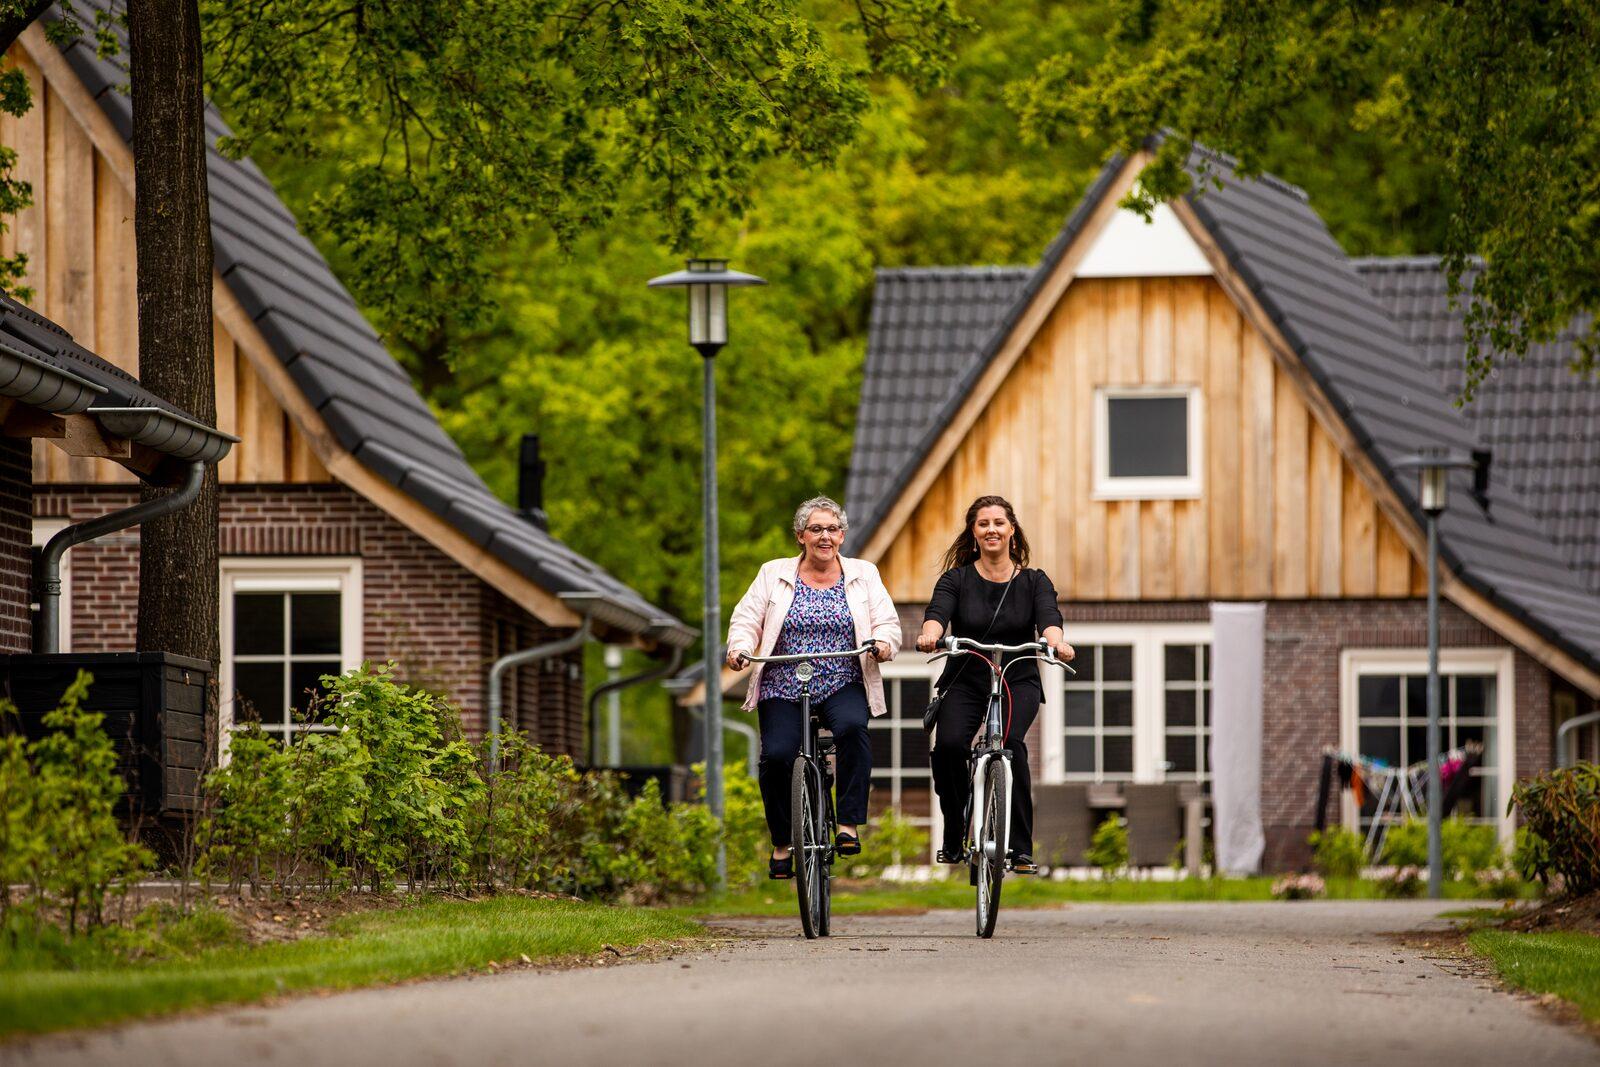 Renting bicycles 🚲